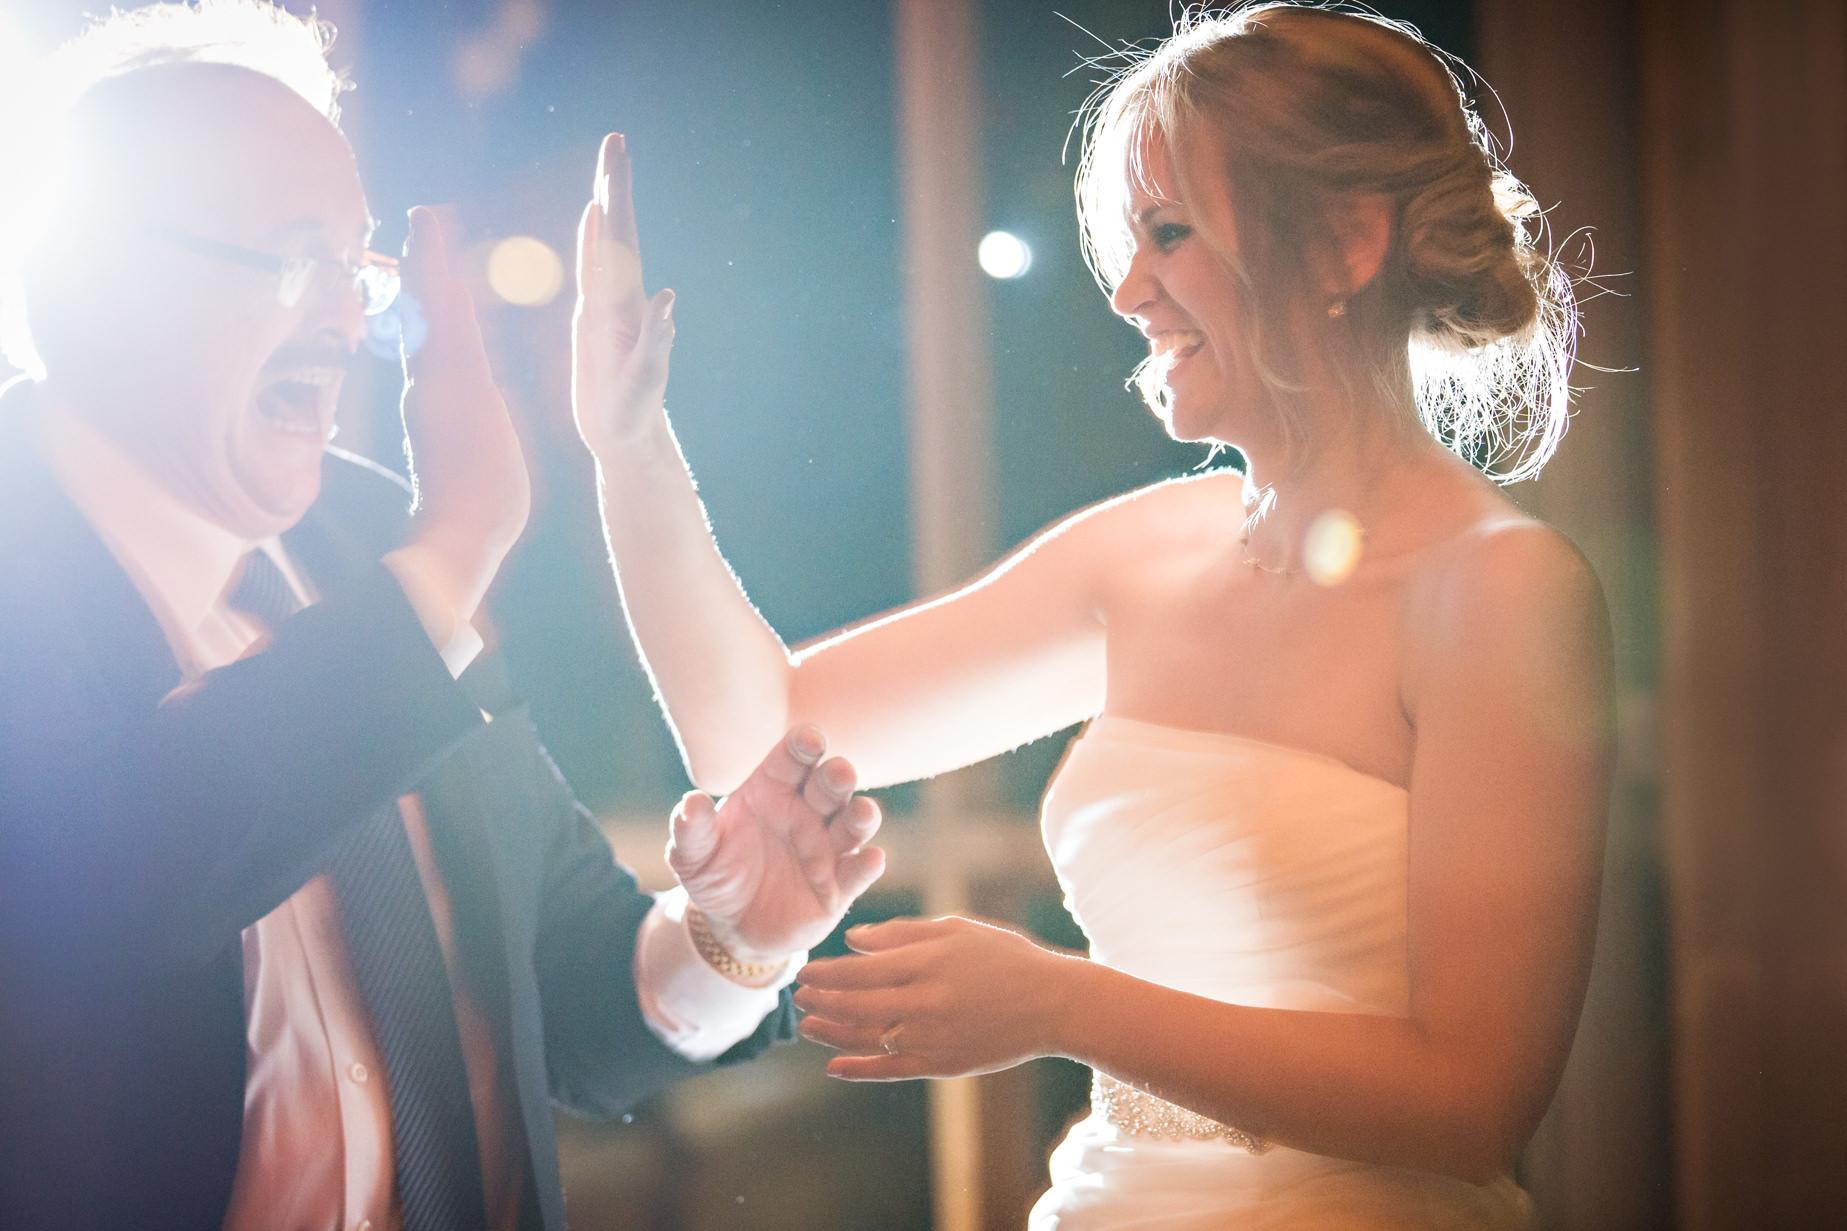 big-sky-resort-wedding-father-daughter-high-five.jpg